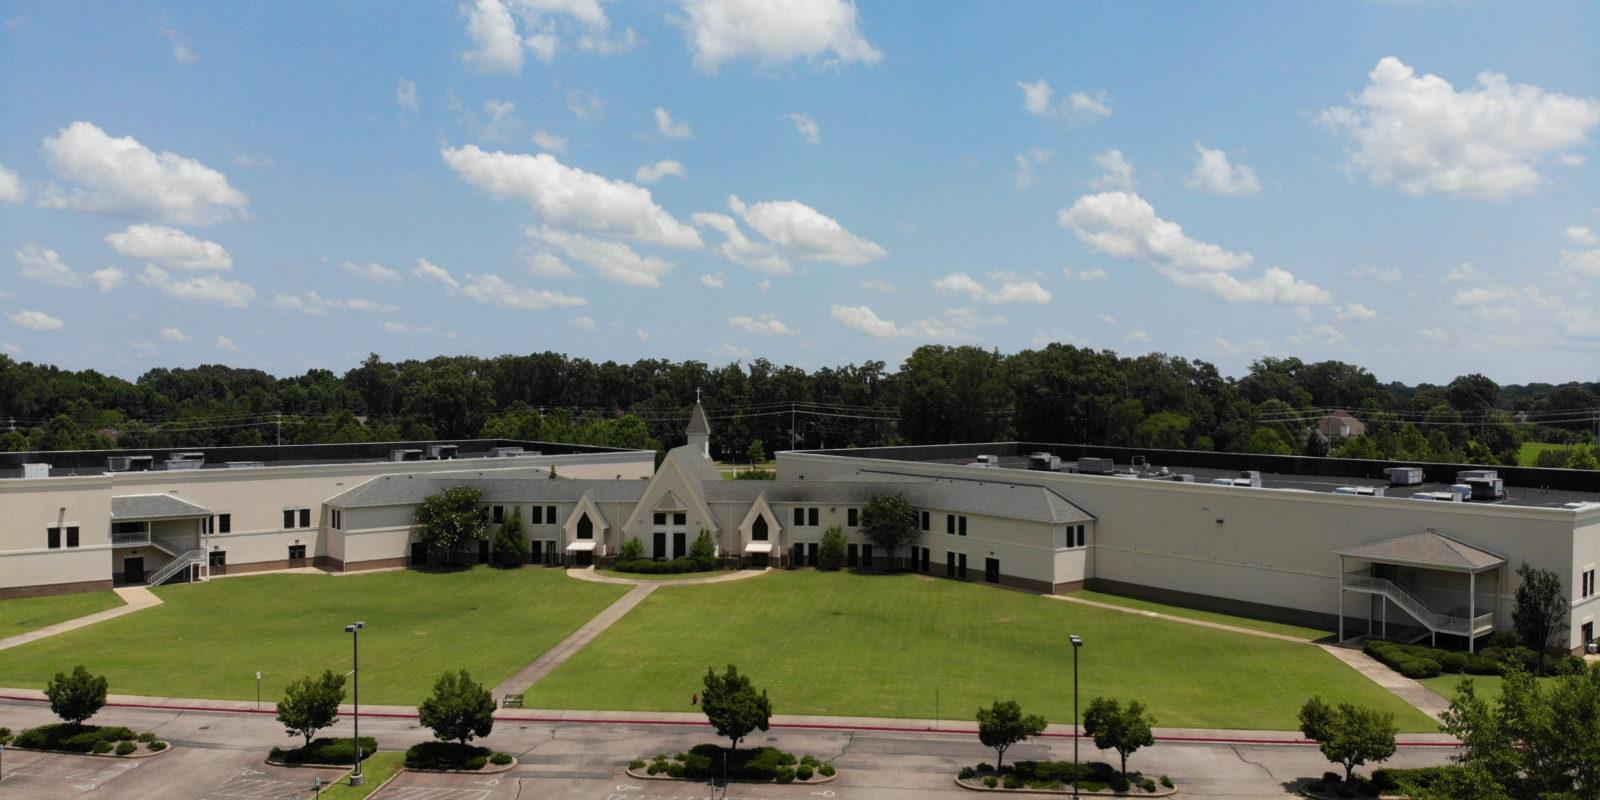 jim-west-central-church-collierville-tn-architectural-4